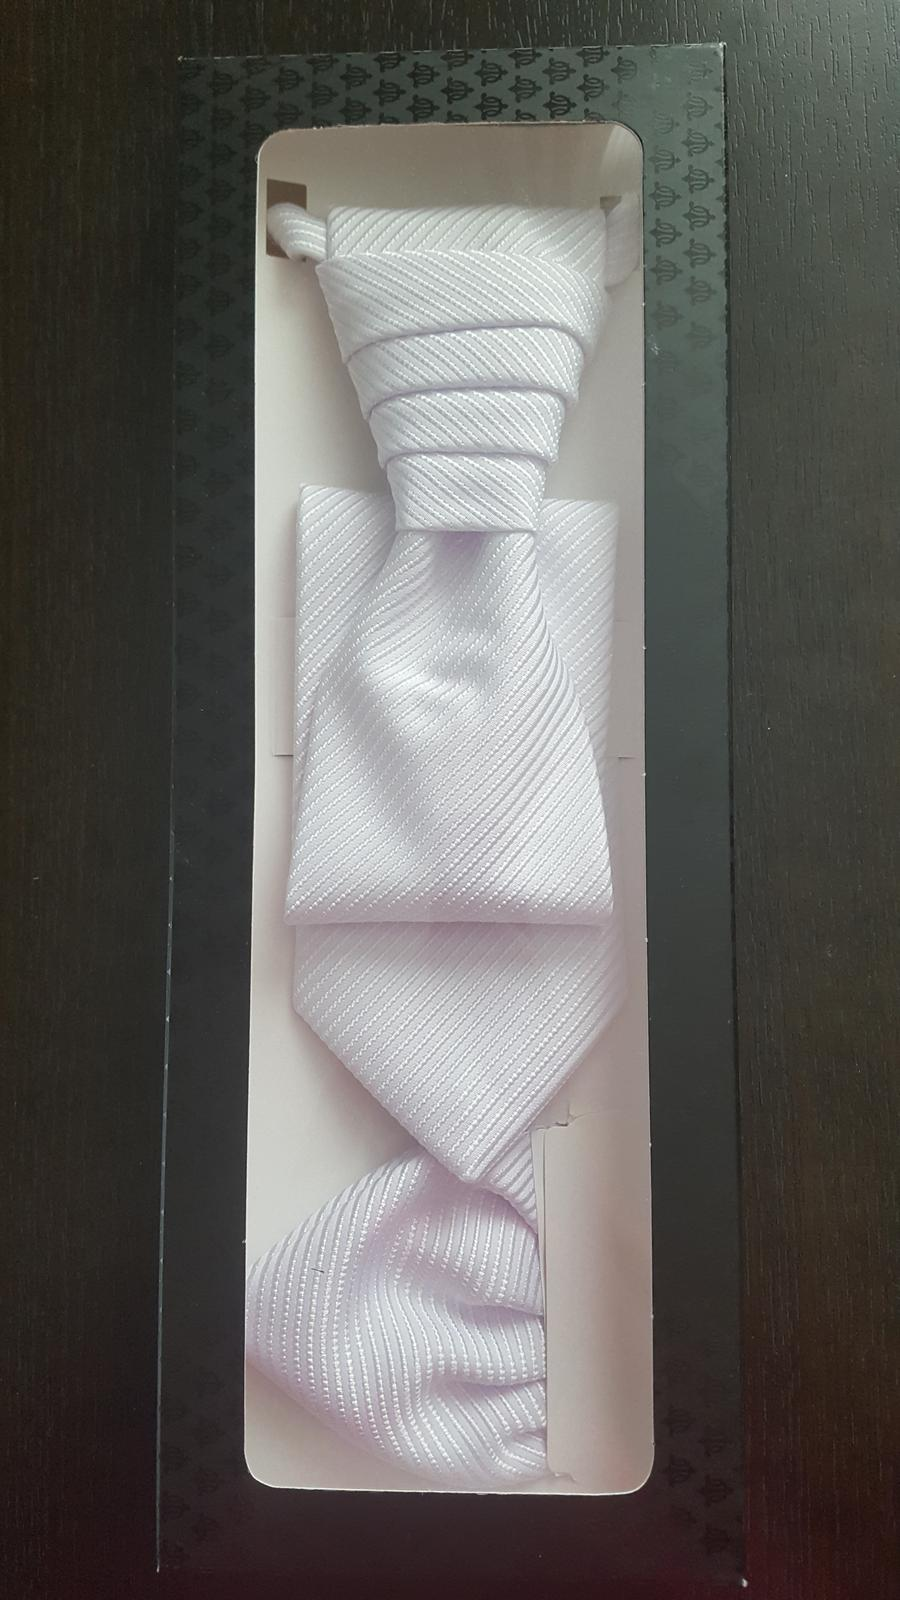 Svadobna kravata s vreckovkou - Obrázok č. 1